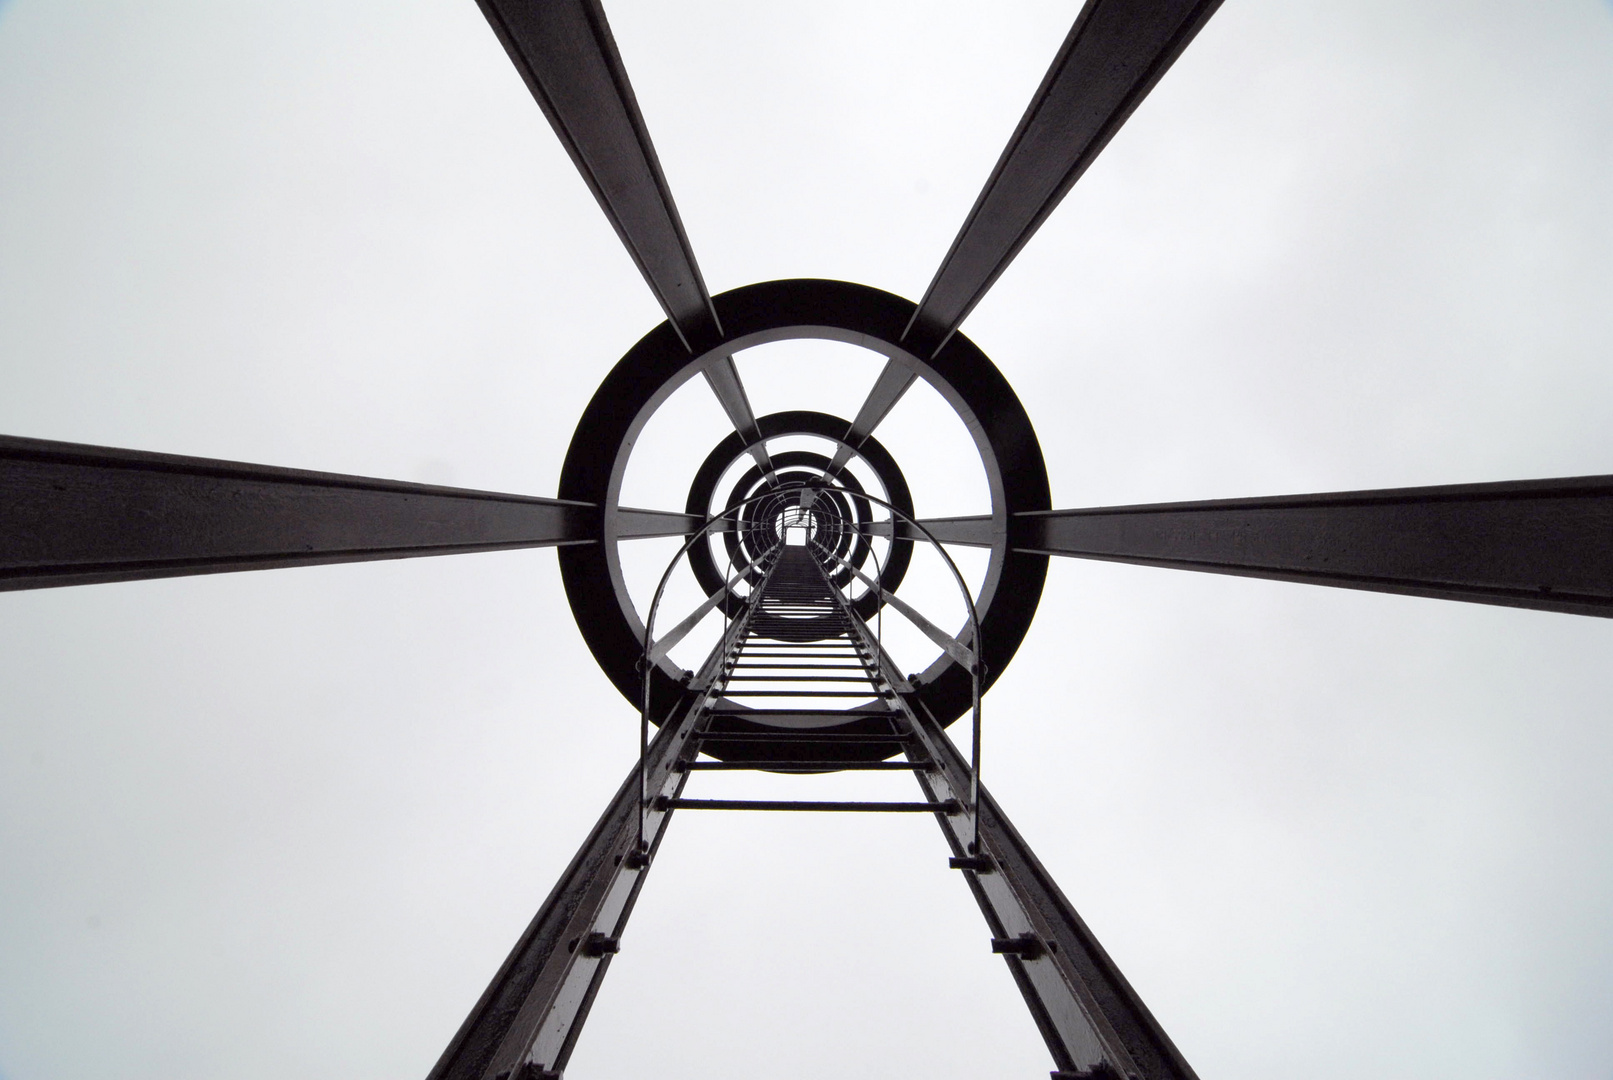 Stahlturm